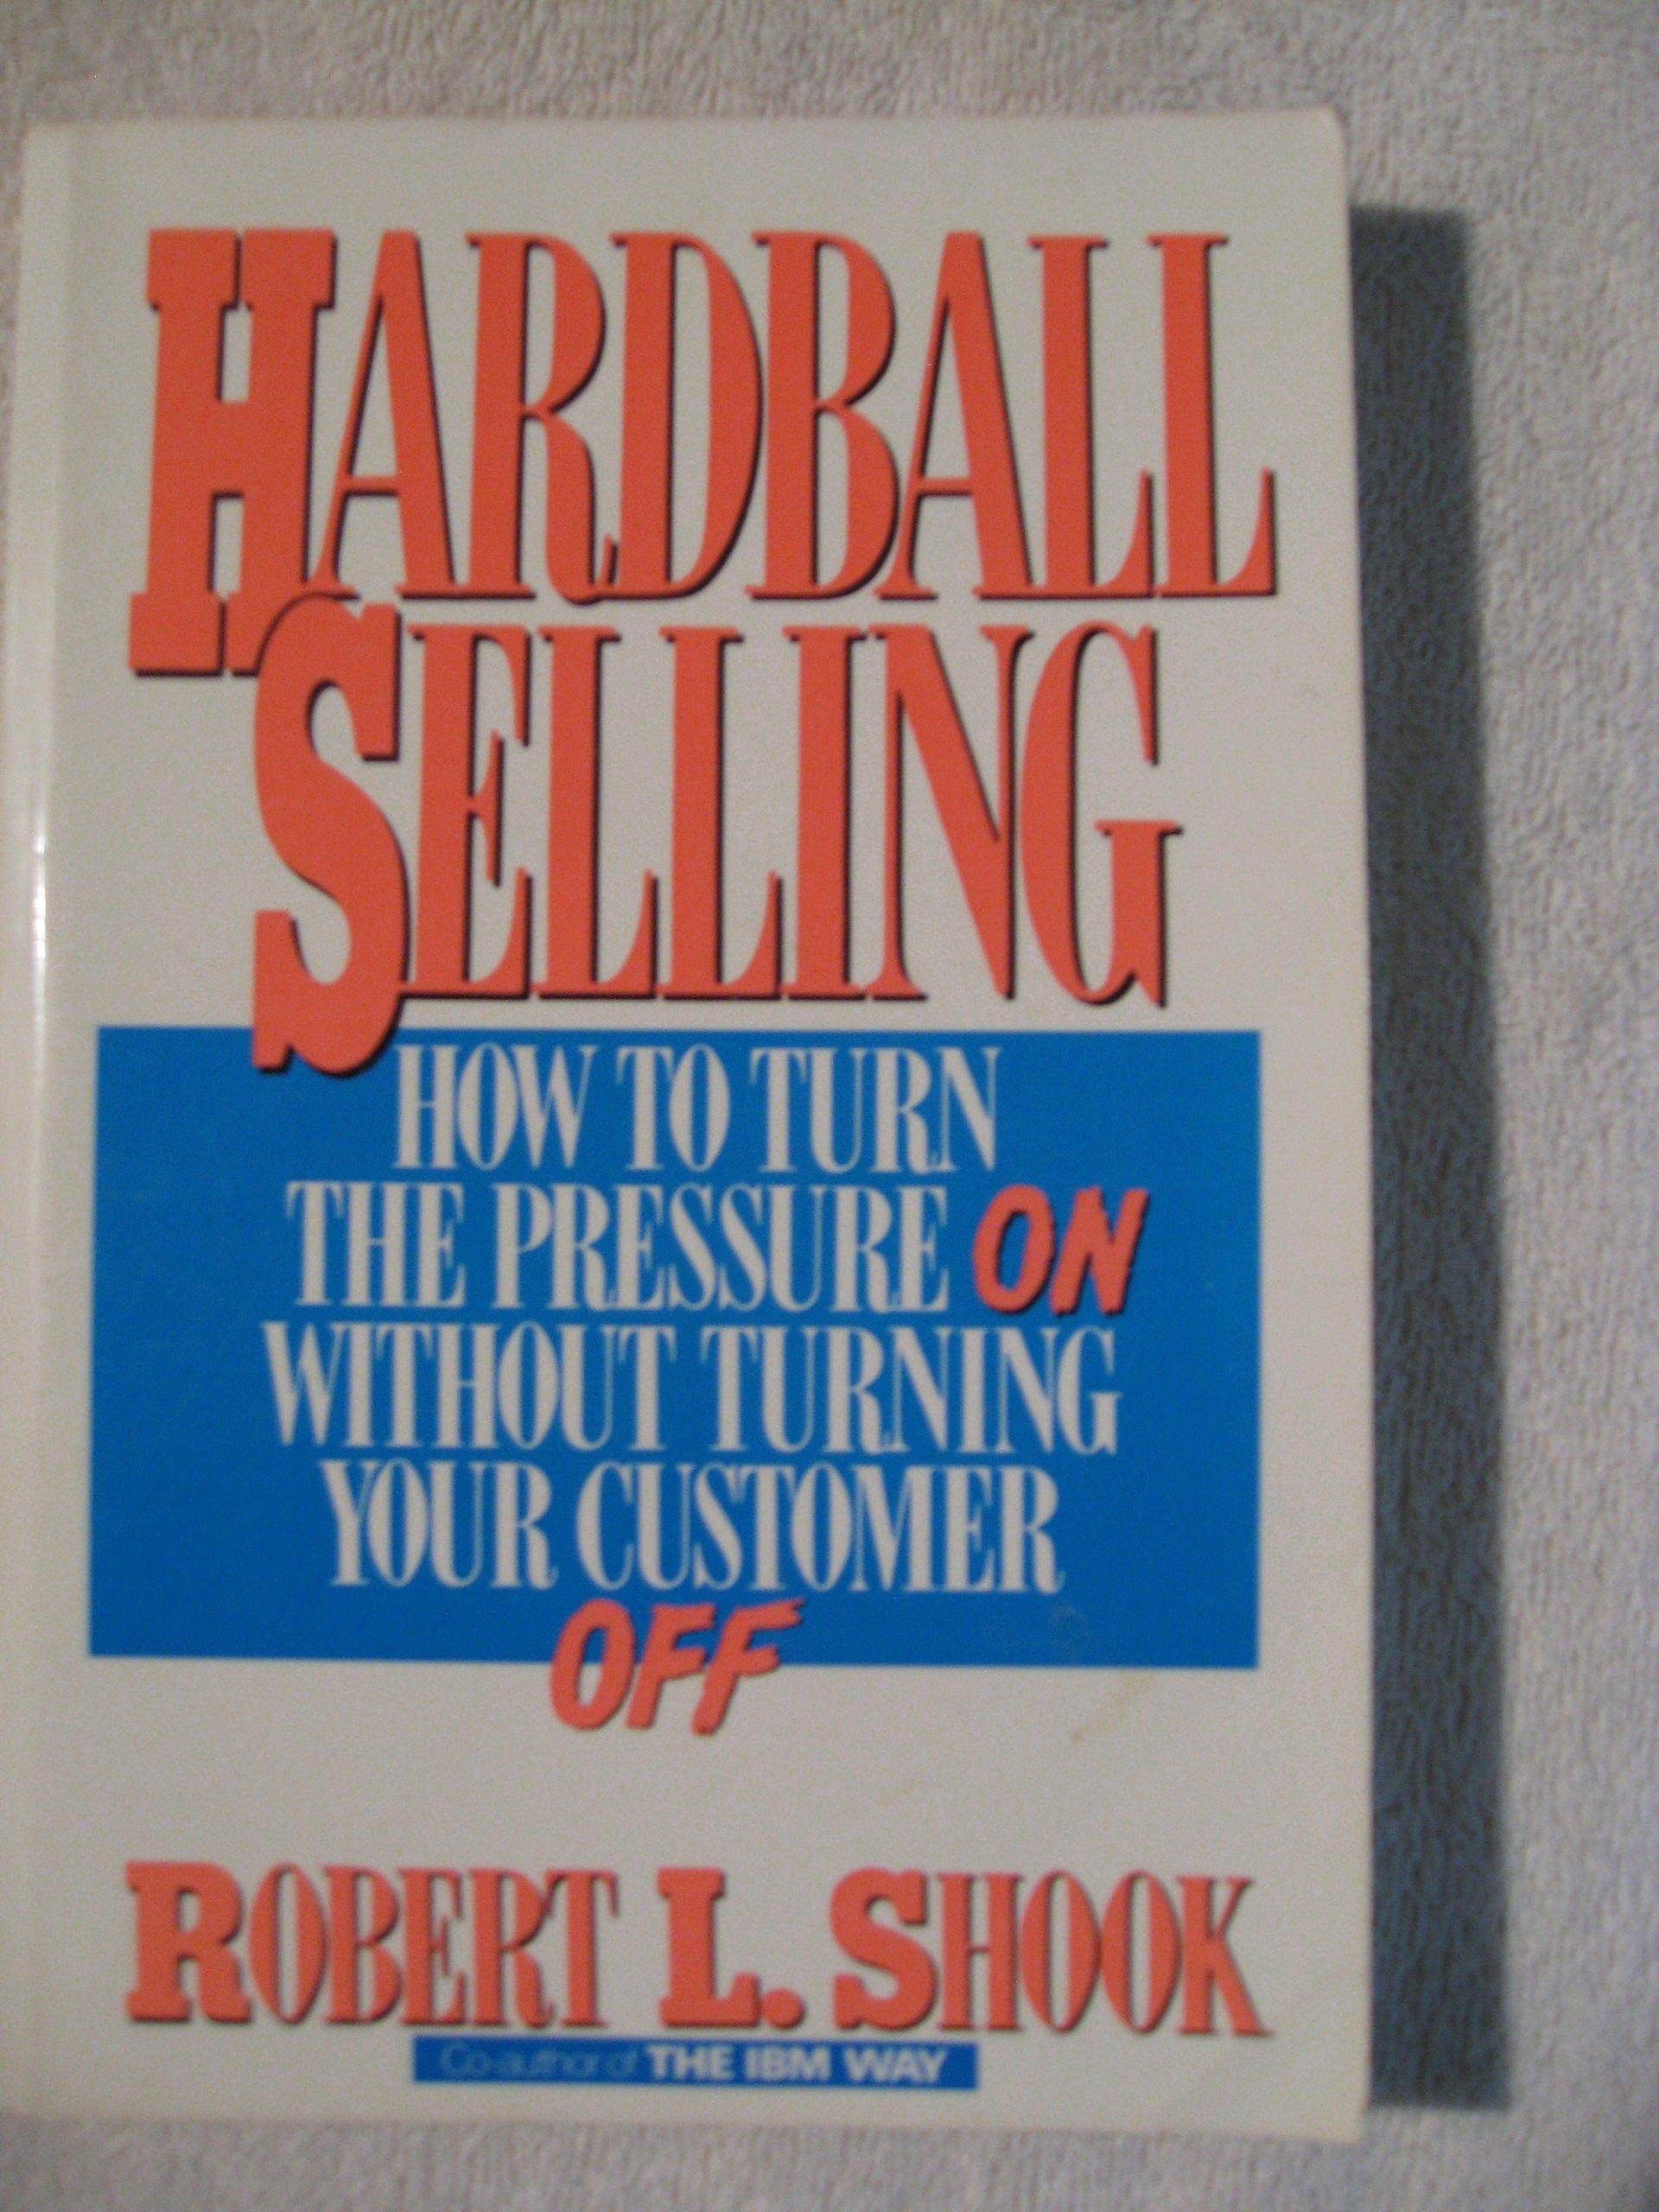 hardball selling shook robert l